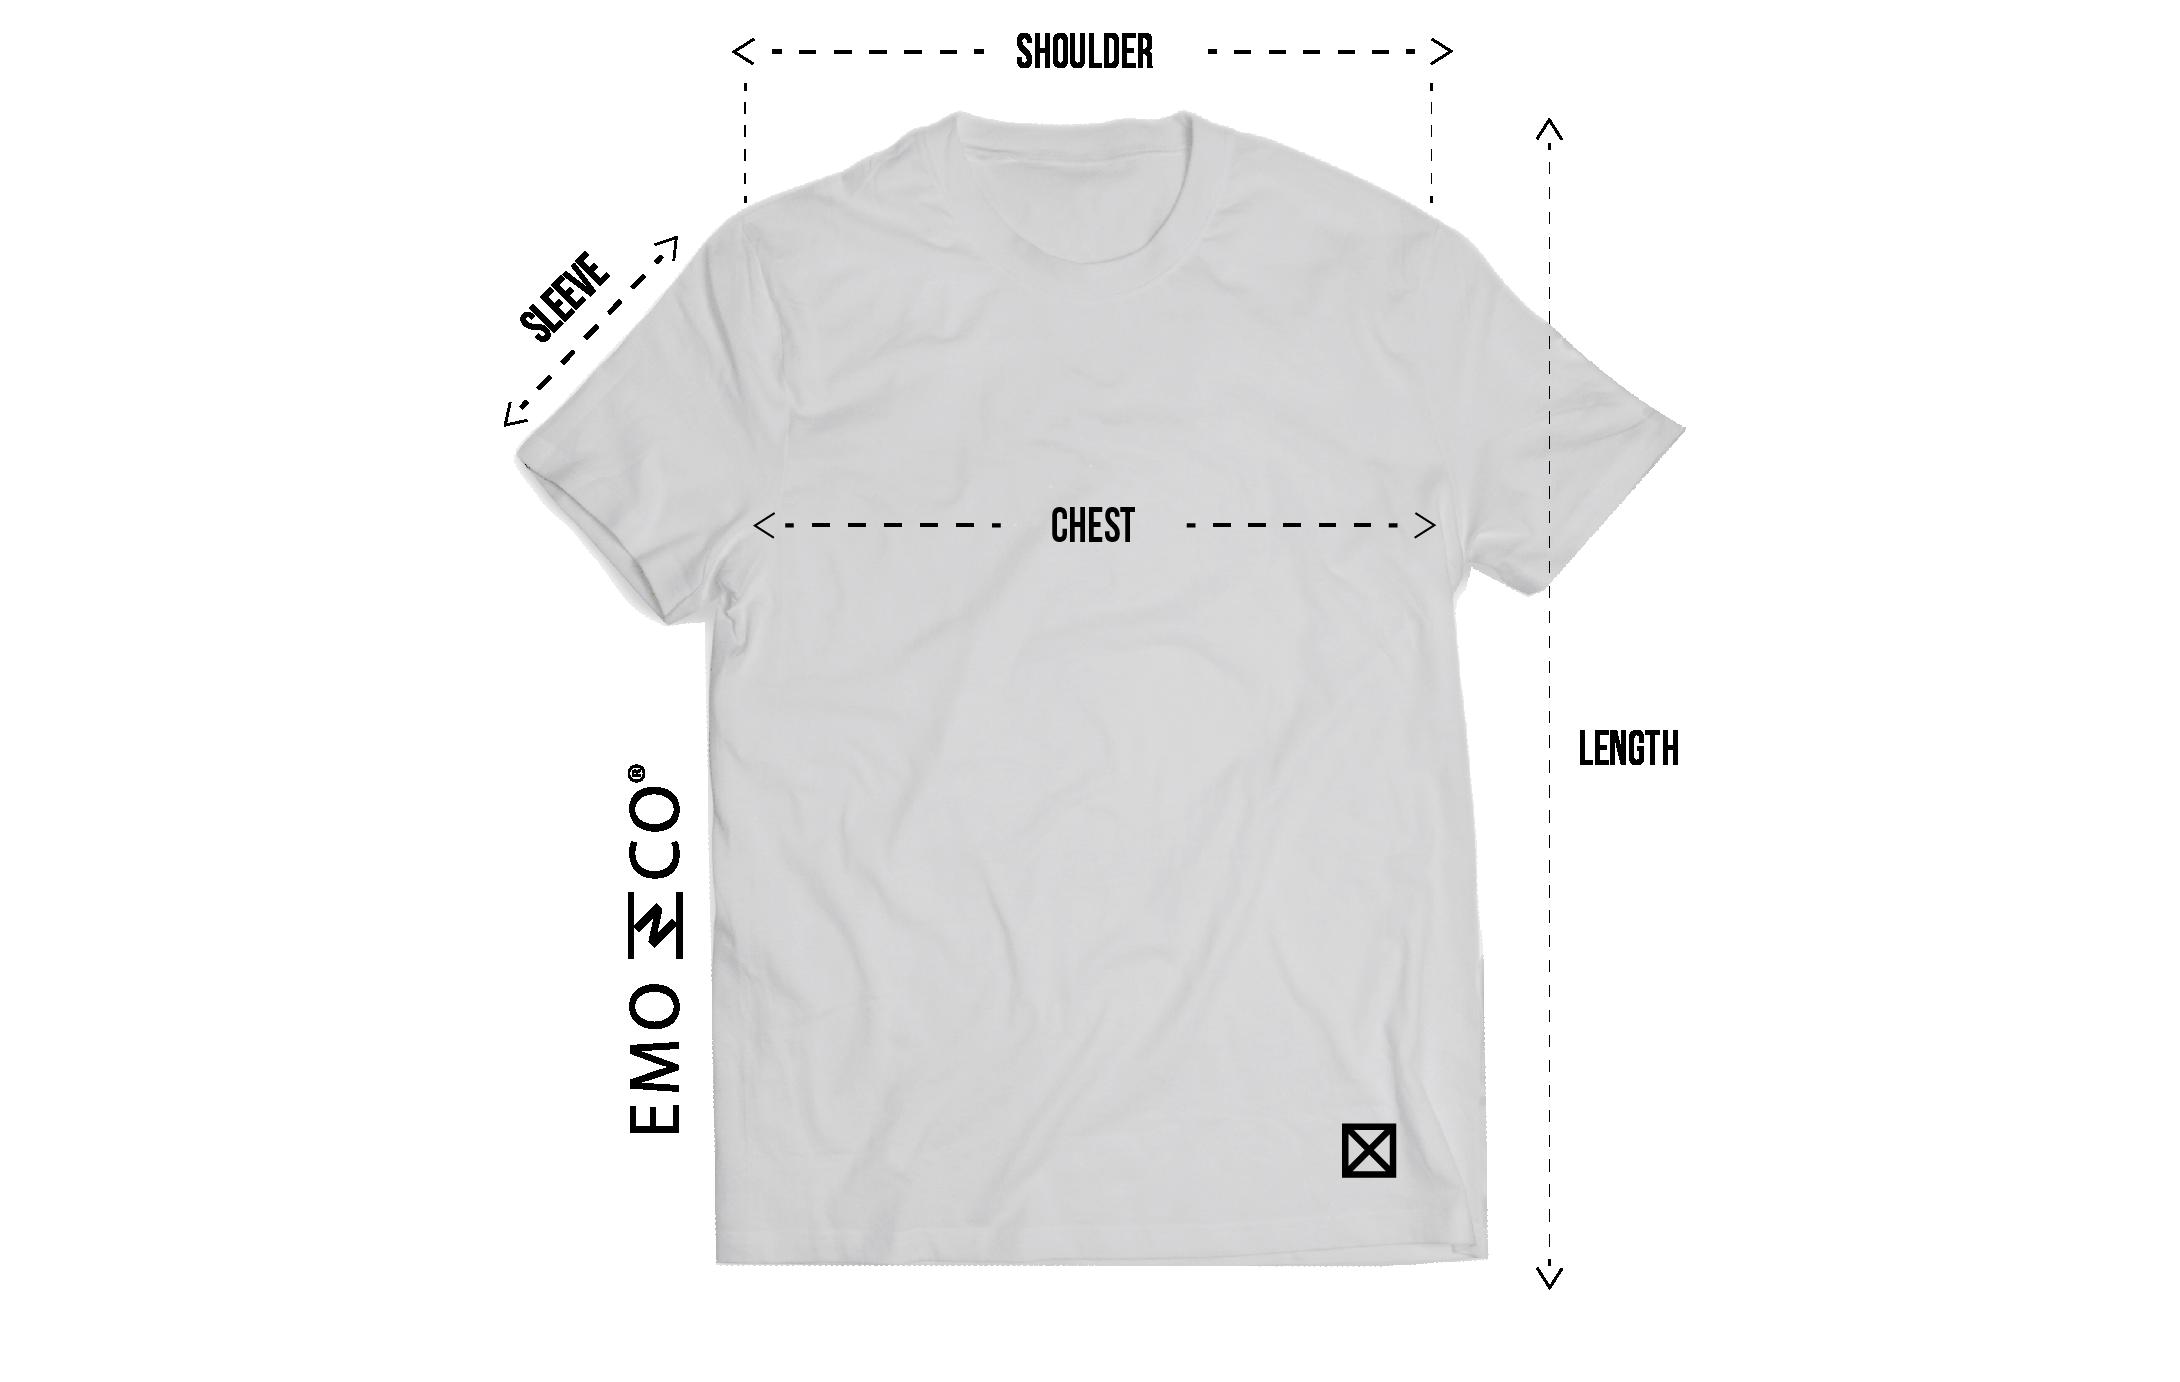 T-shirt size chart.png